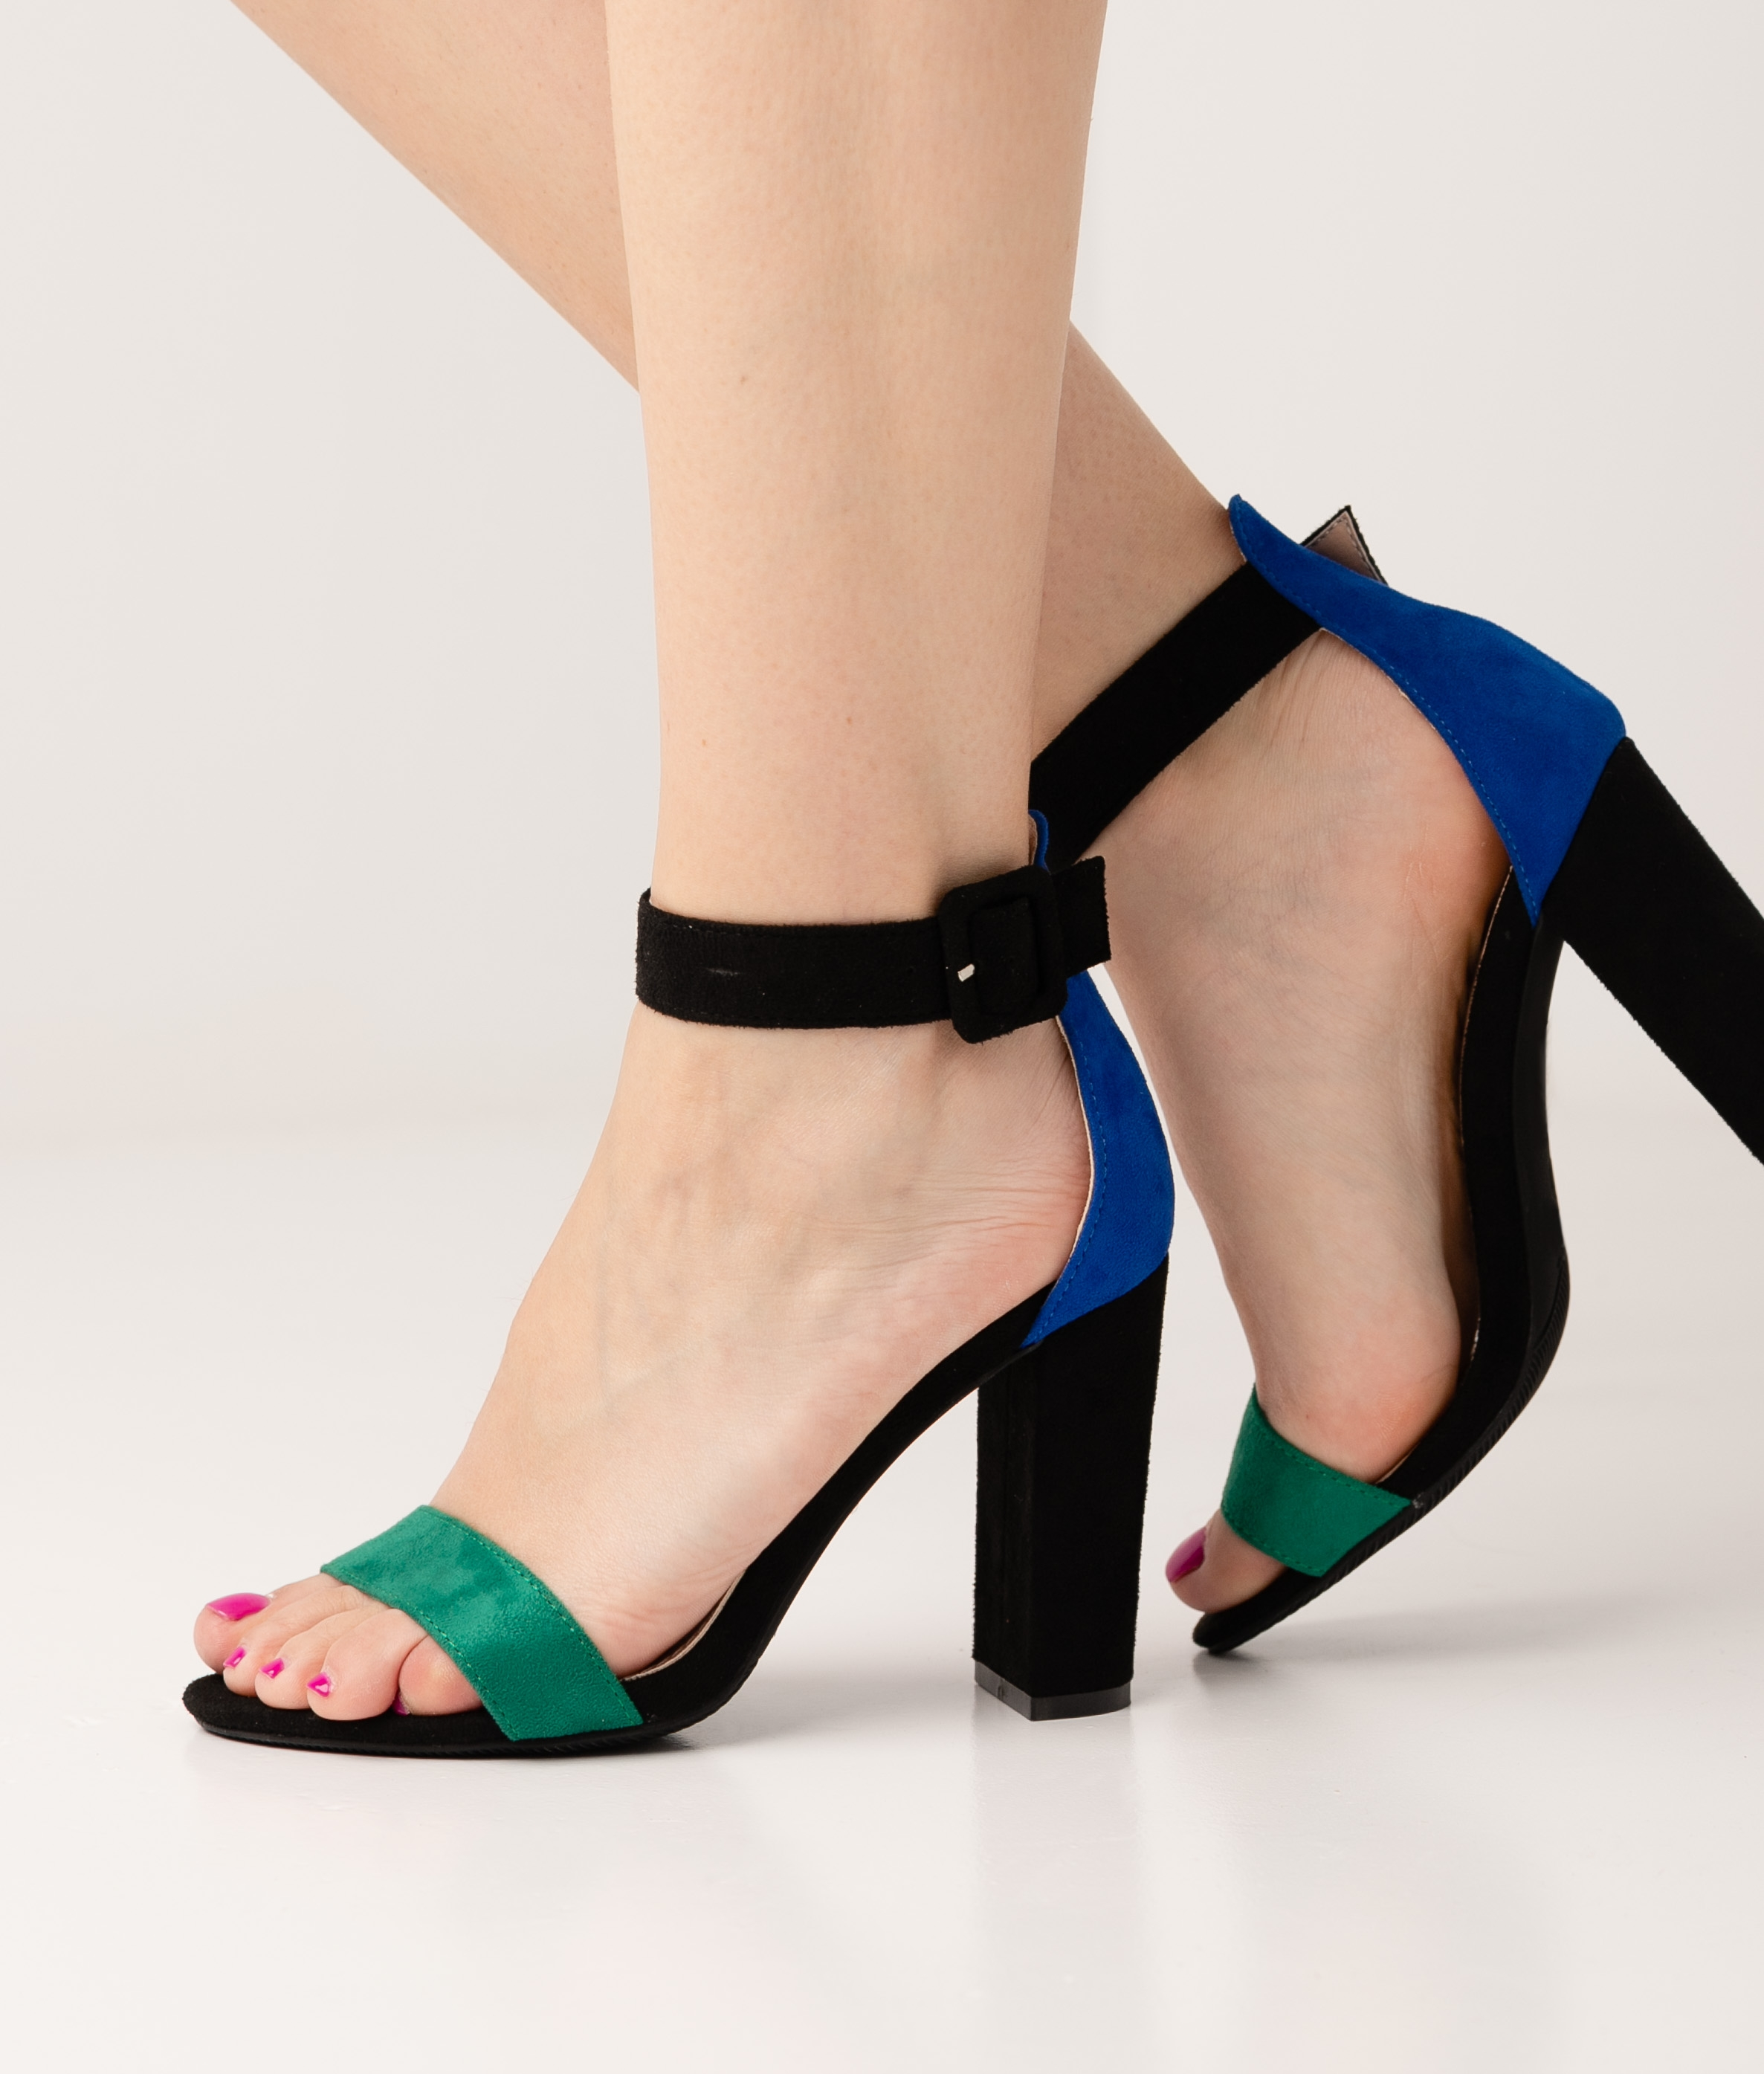 Sandalo Alto Noah - Verde/Blu